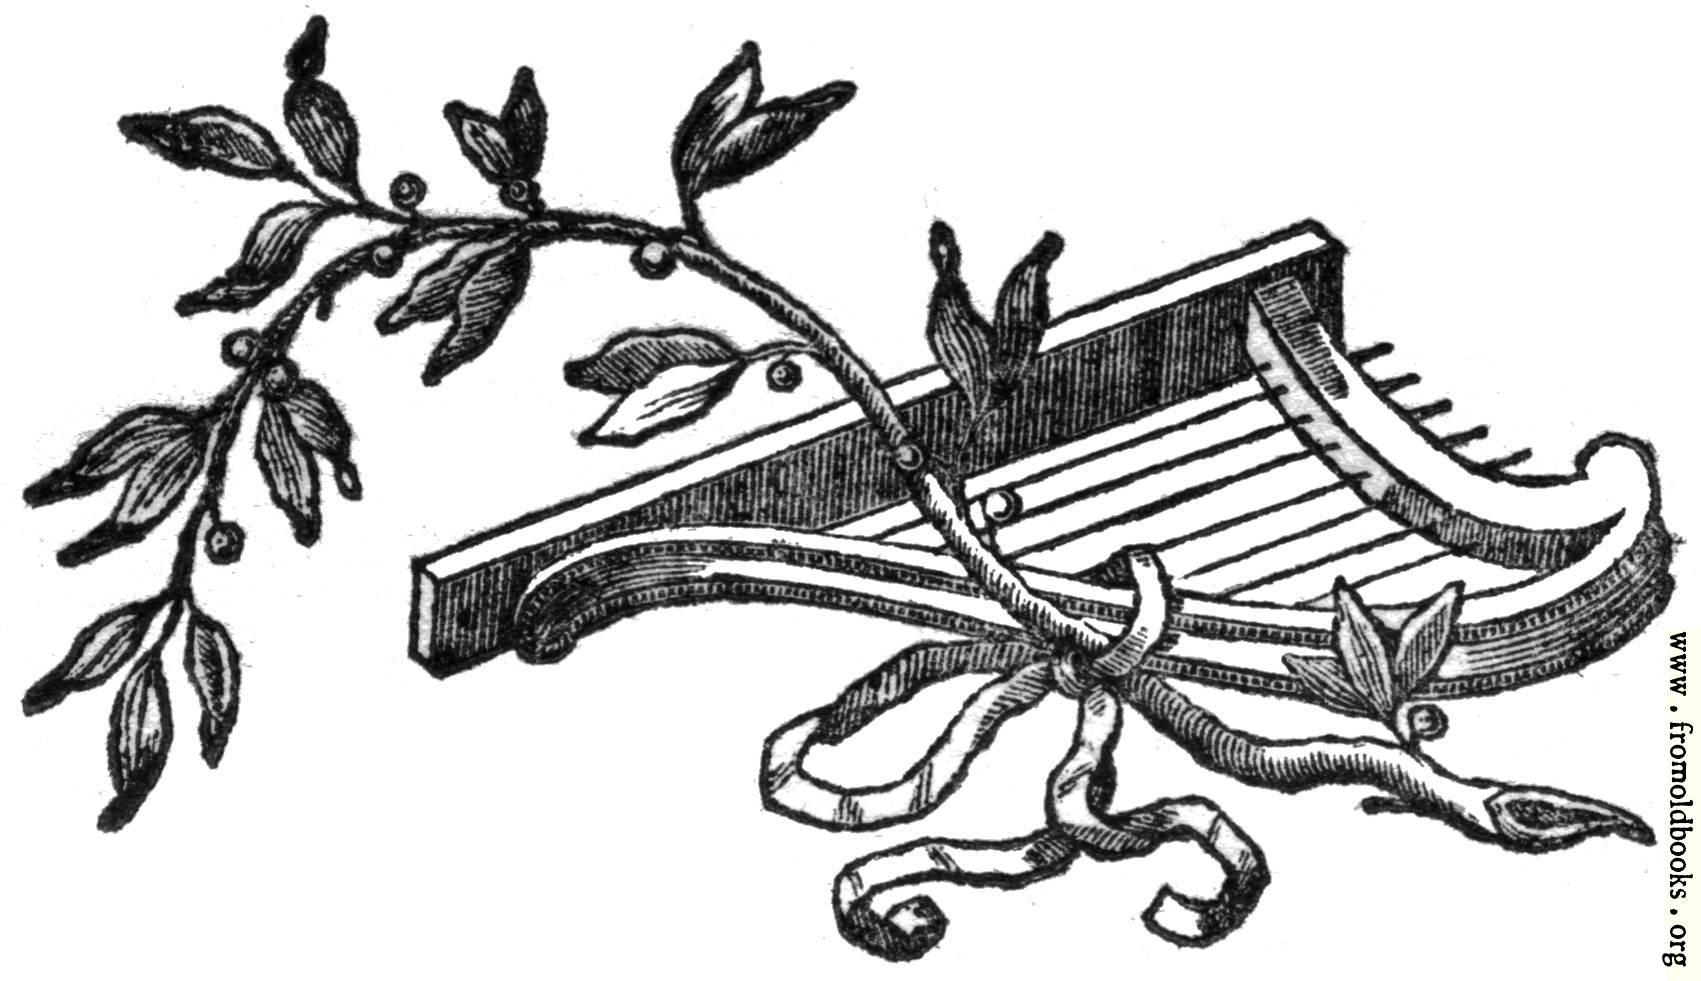 Printer S Ornament With Harp And Vine